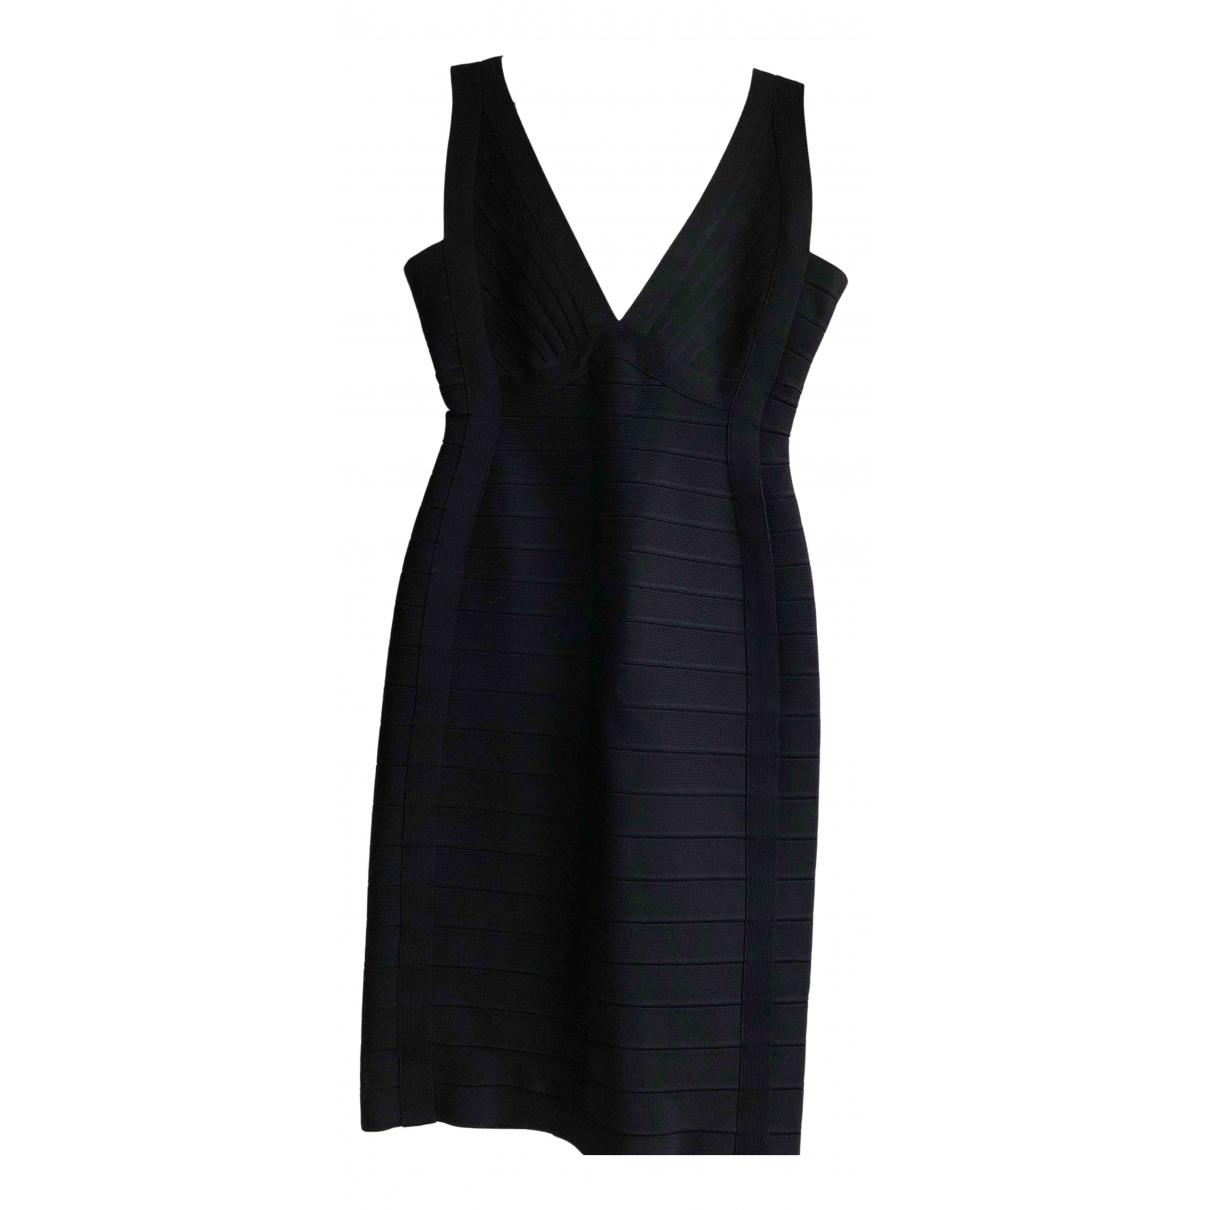 Herve Leger N Black dress for Women 8 UK